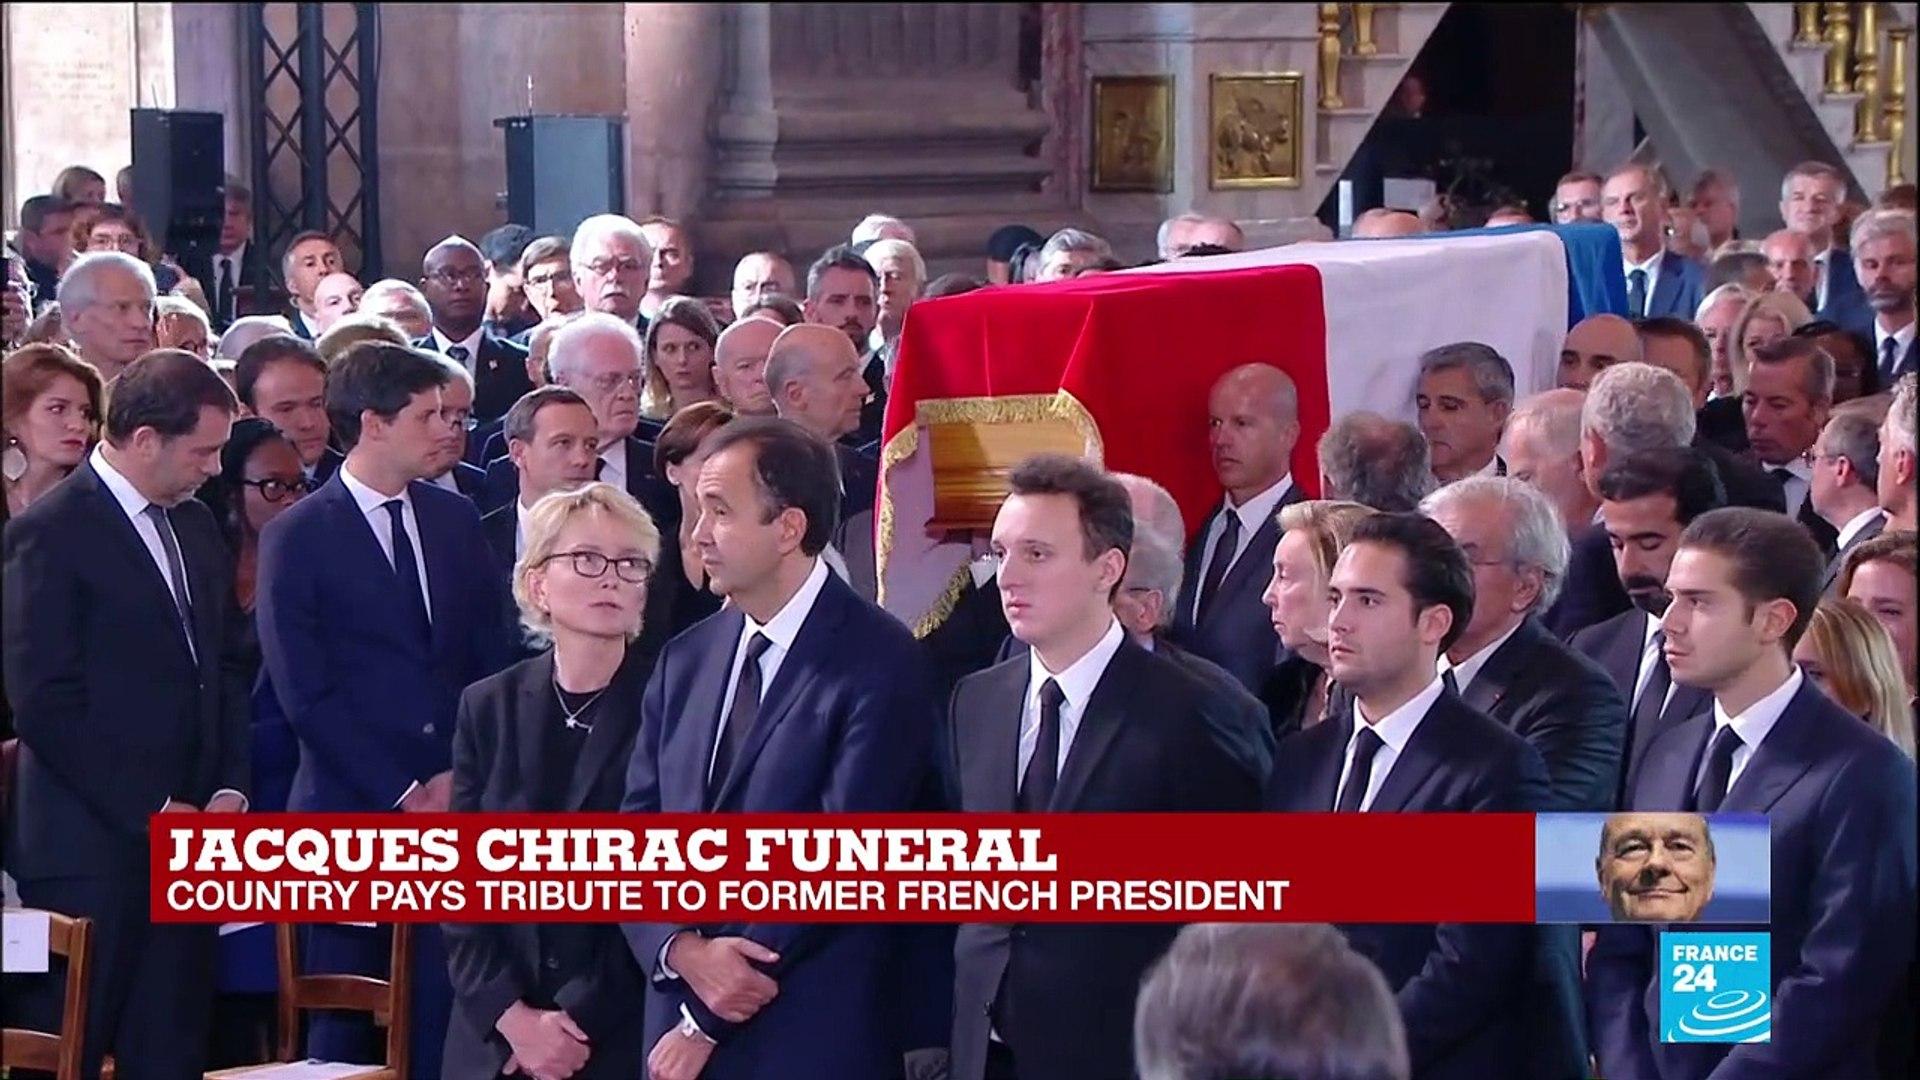 Jacques Chirac funeral: Coffin enters Saint-Sulpice church